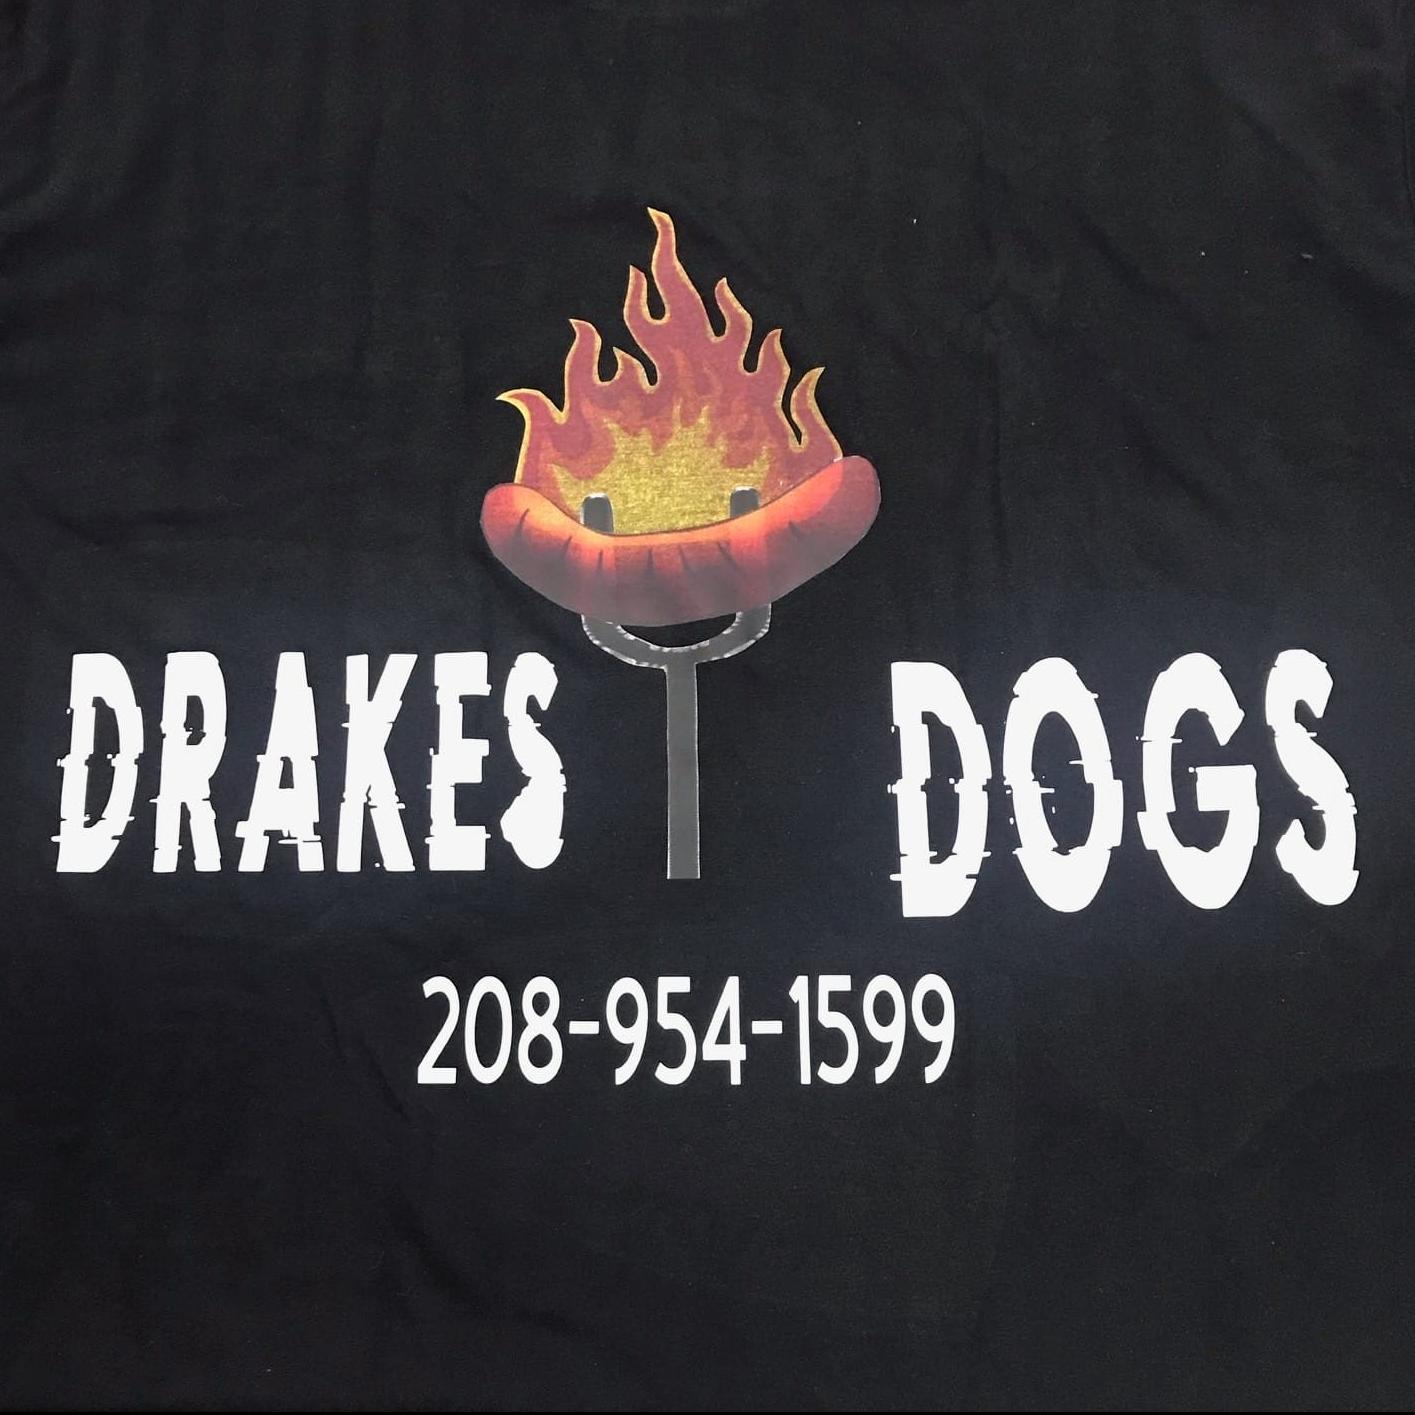 Drakes Dogs logo